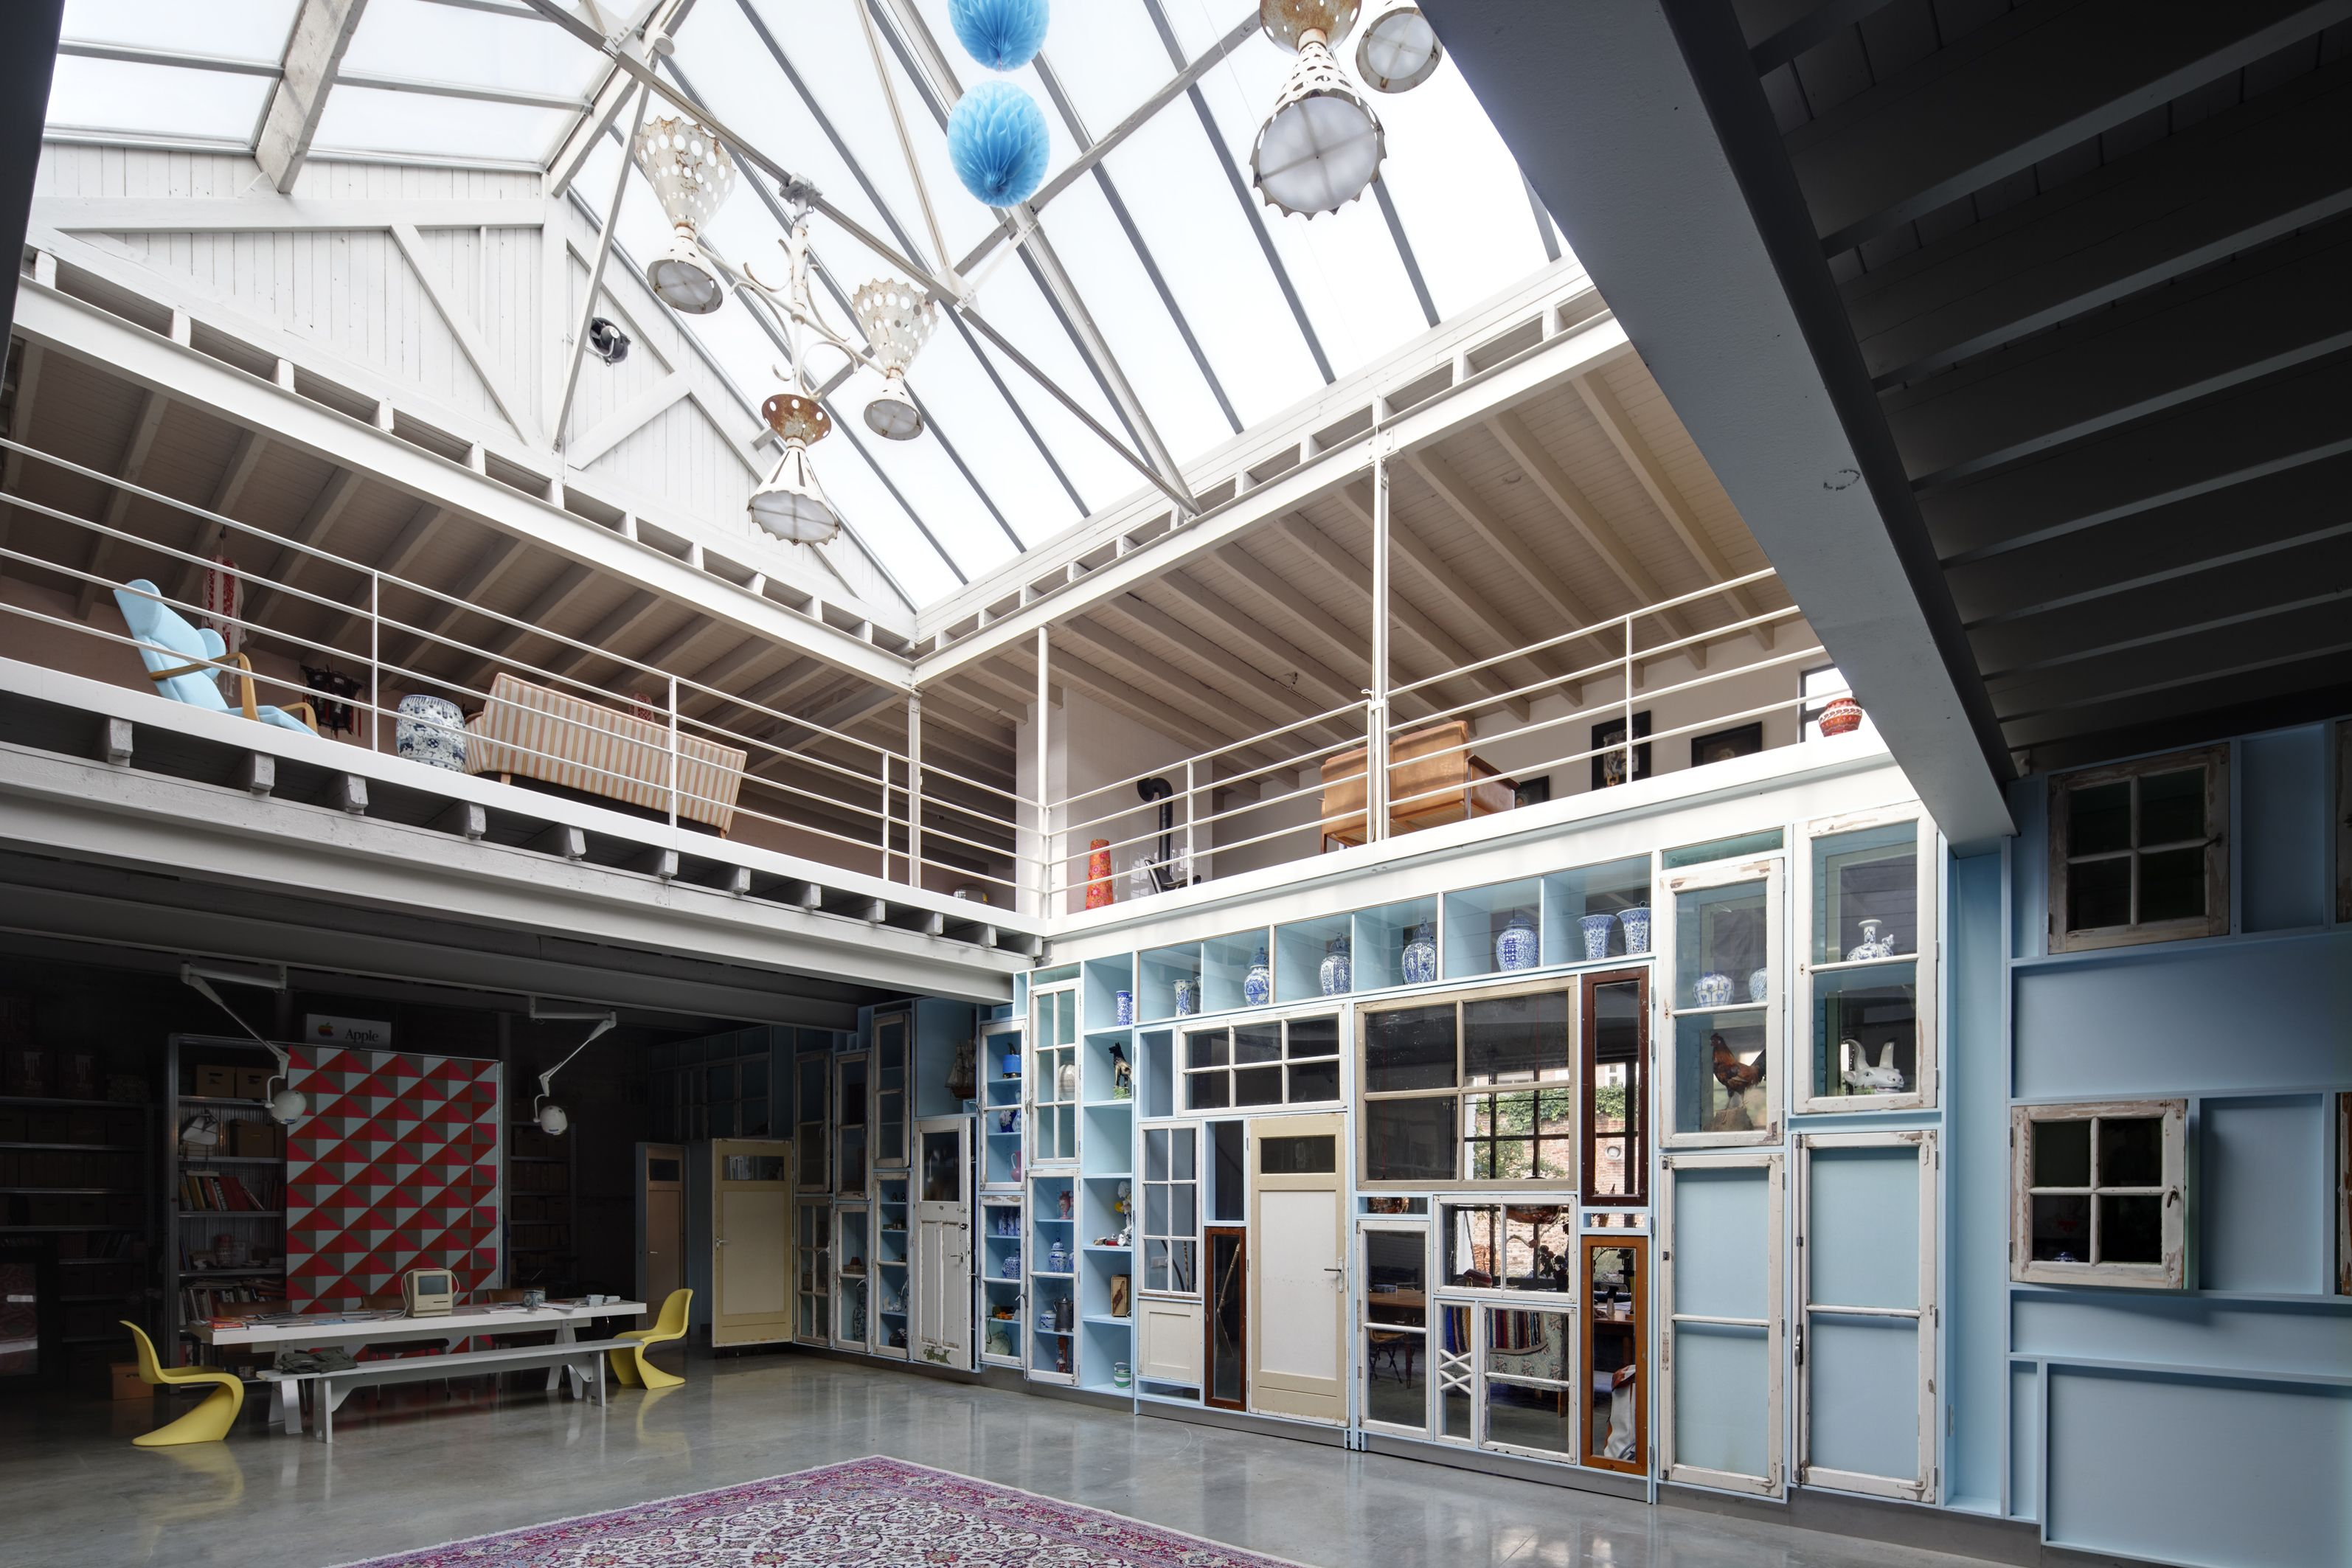 Garage Inrichting Gebruikt : Transformatie garage tot woonwerkhuis architectuur